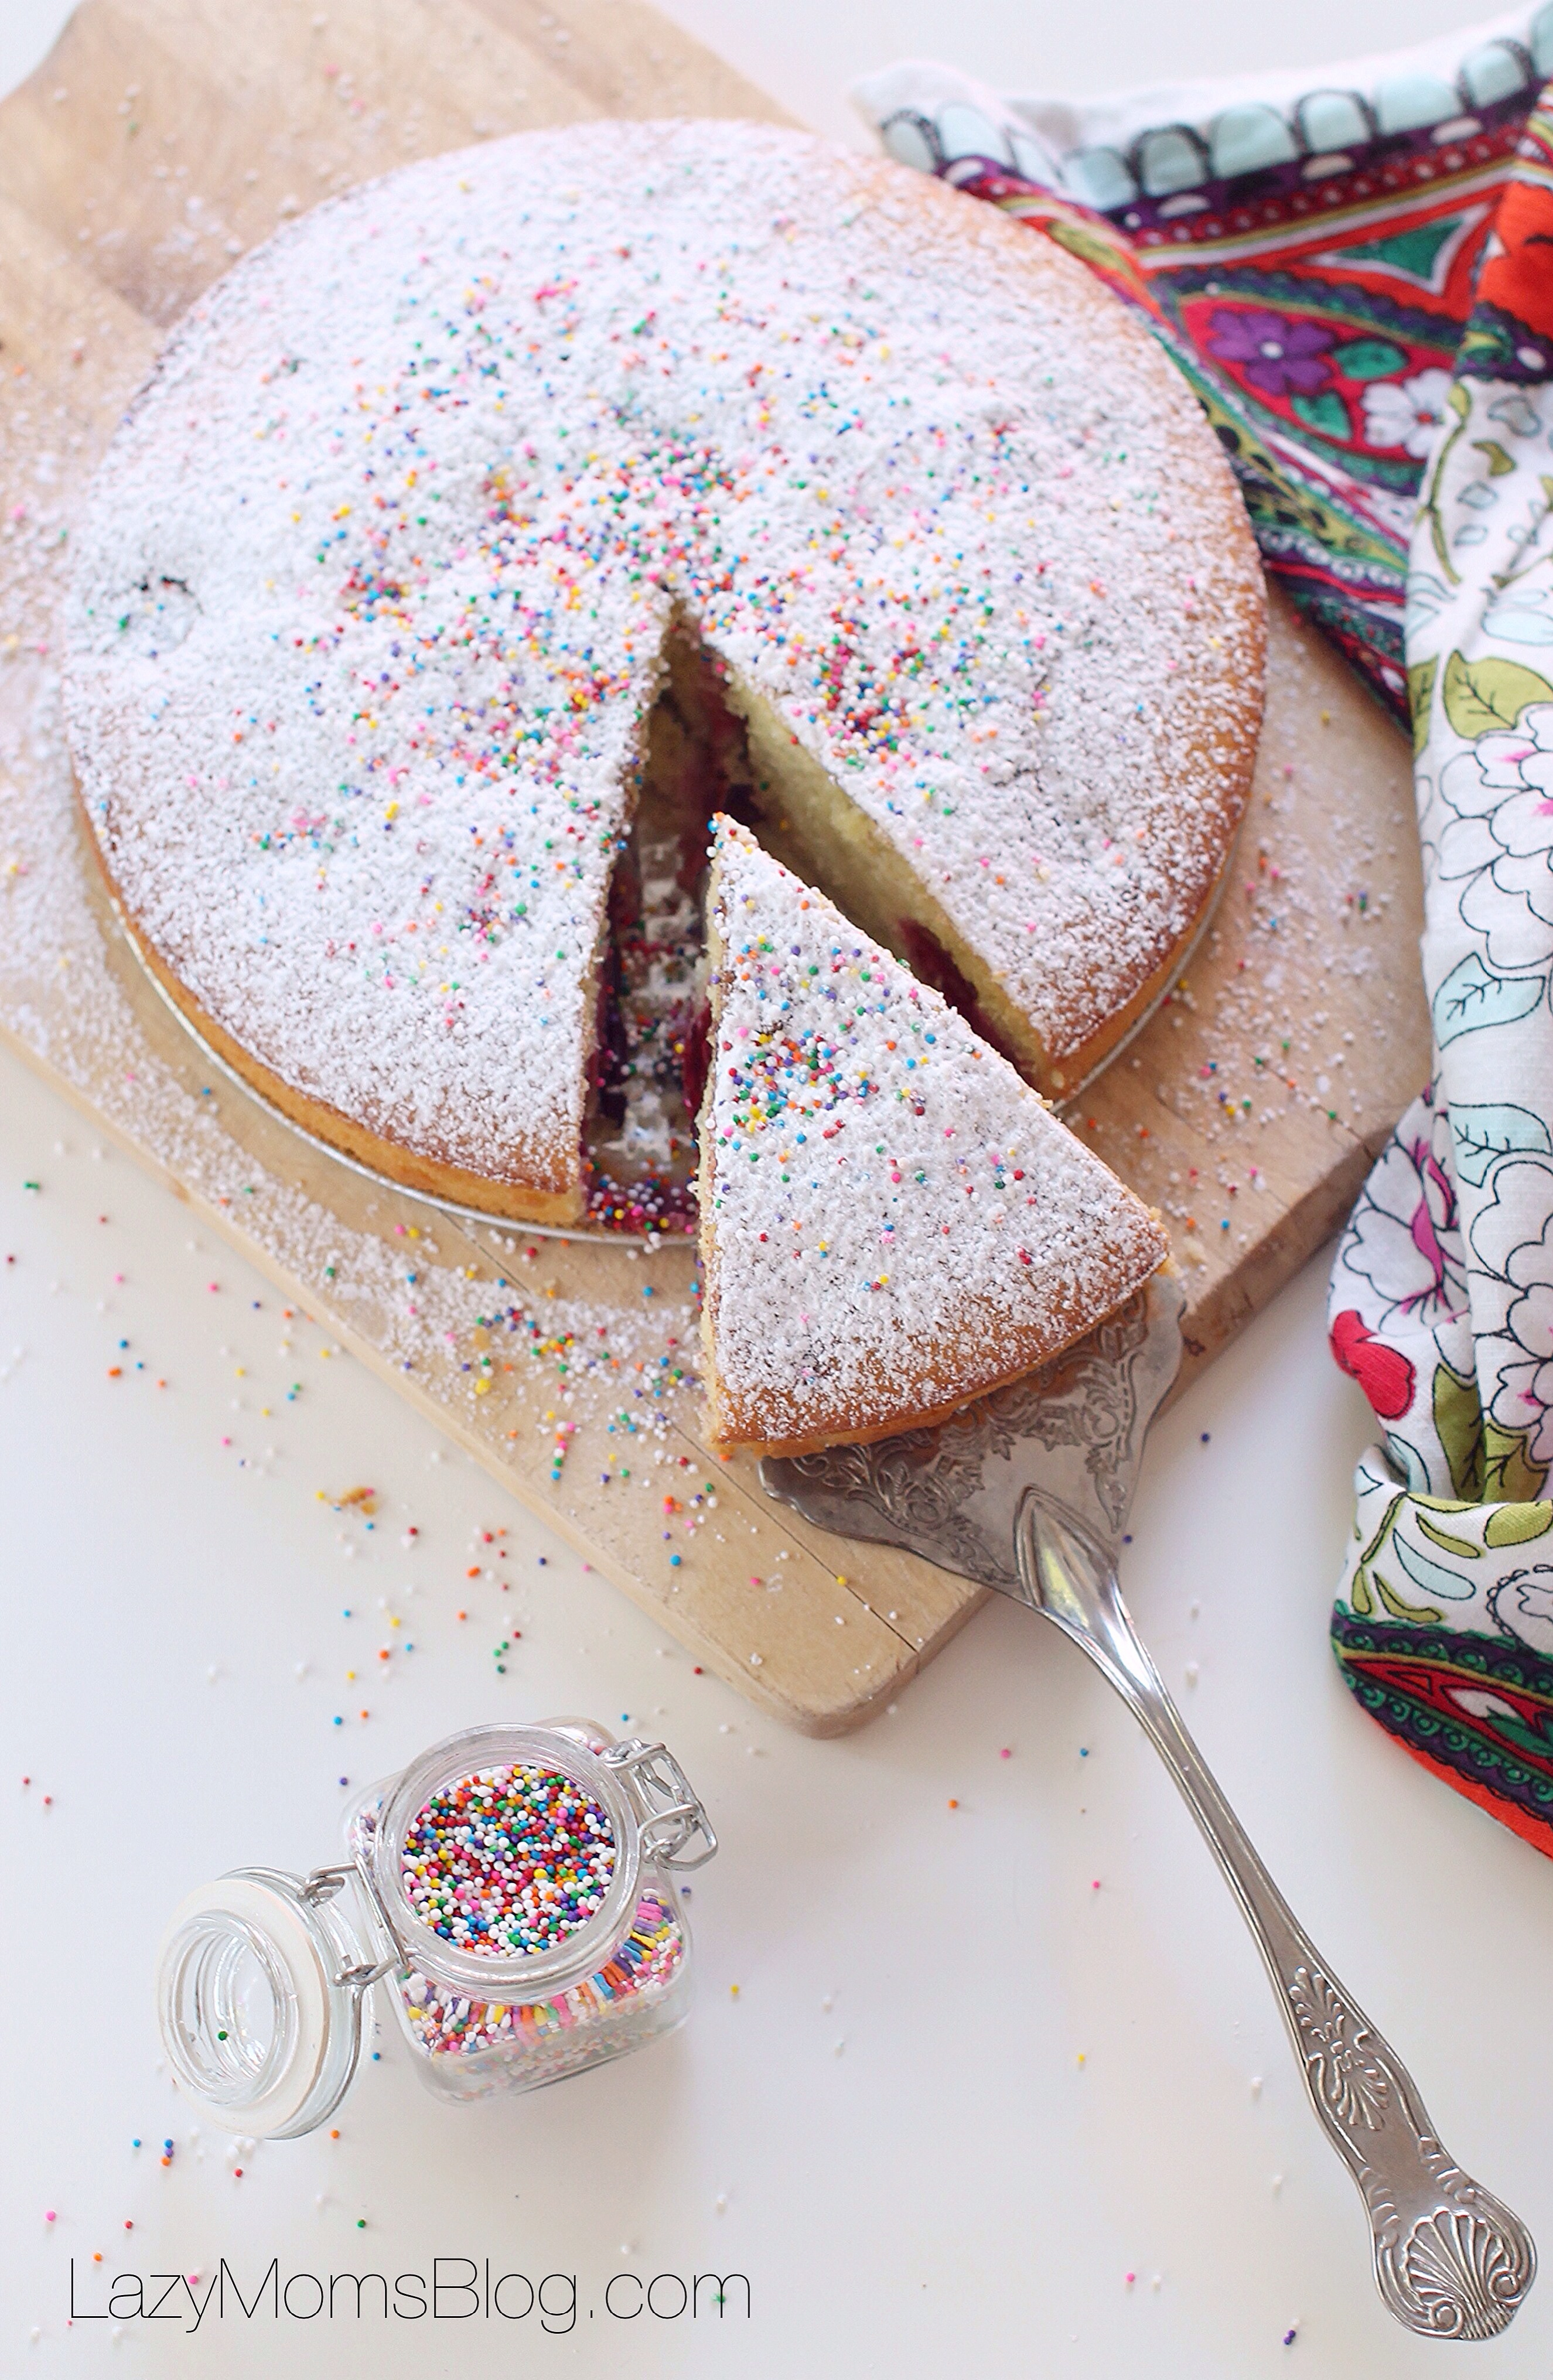 ed this plum cake tastes just like doughnuts with plum jam